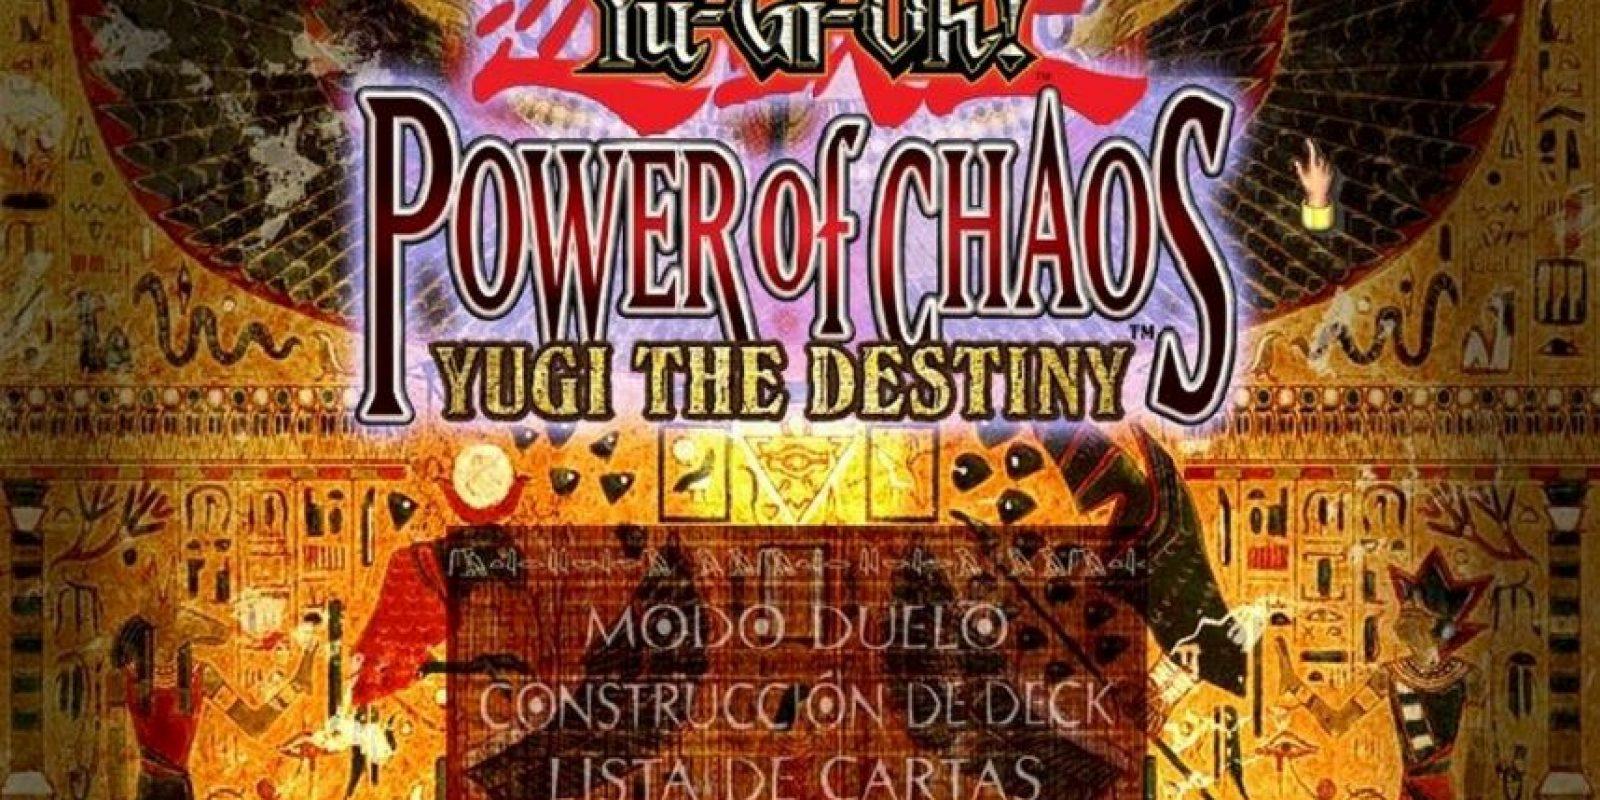 Yu-Gi-Oh! Power of Chaos: Yugi the Destiny (2004). Foto:Konami